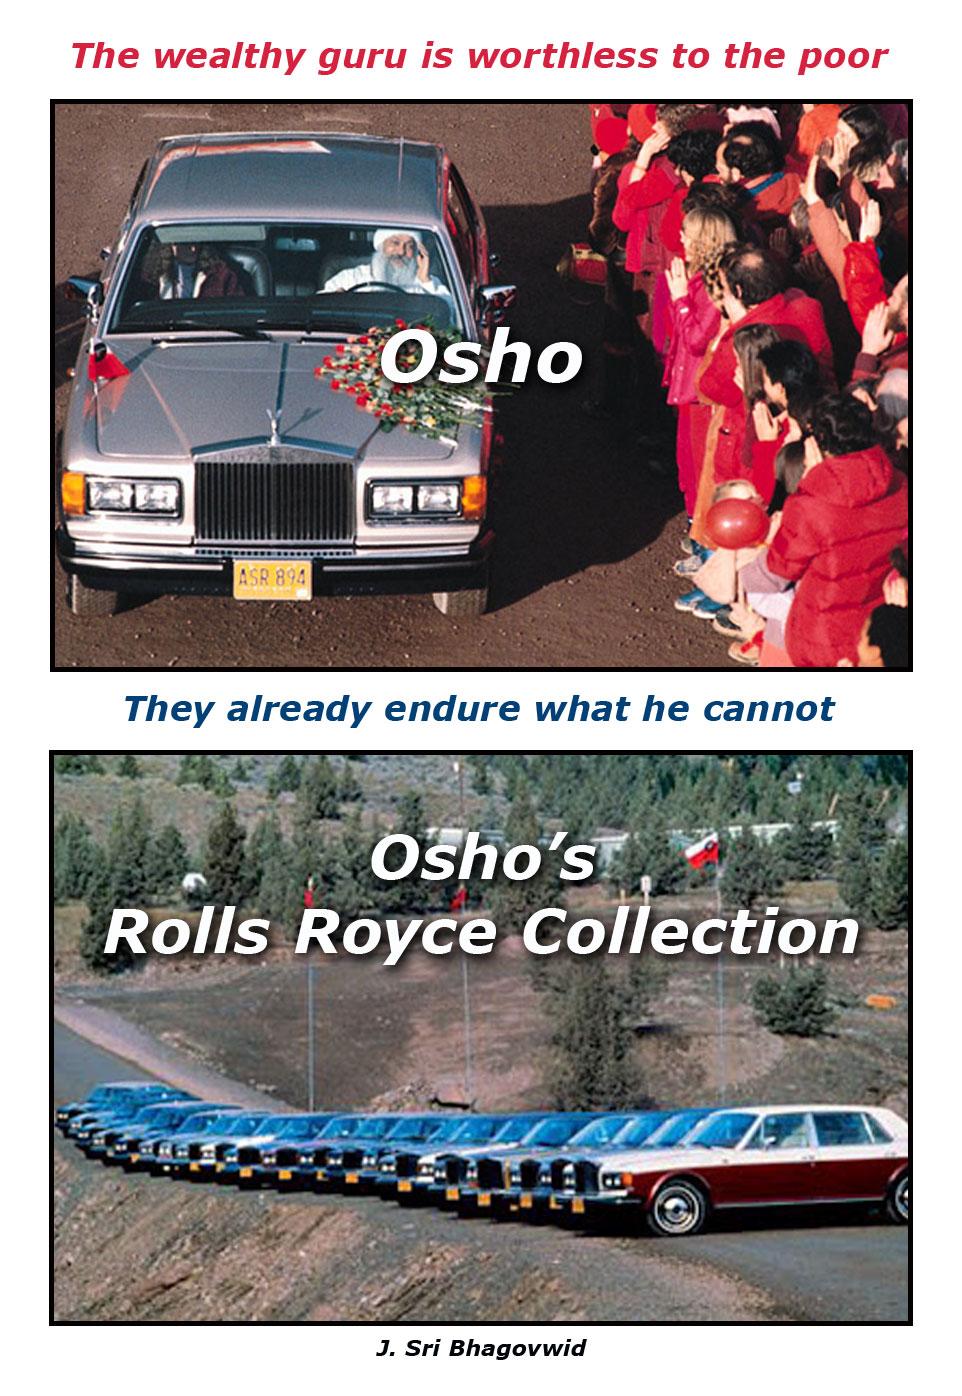 Osho A No Show With 90 Rolls Royces Art Amp Criticism